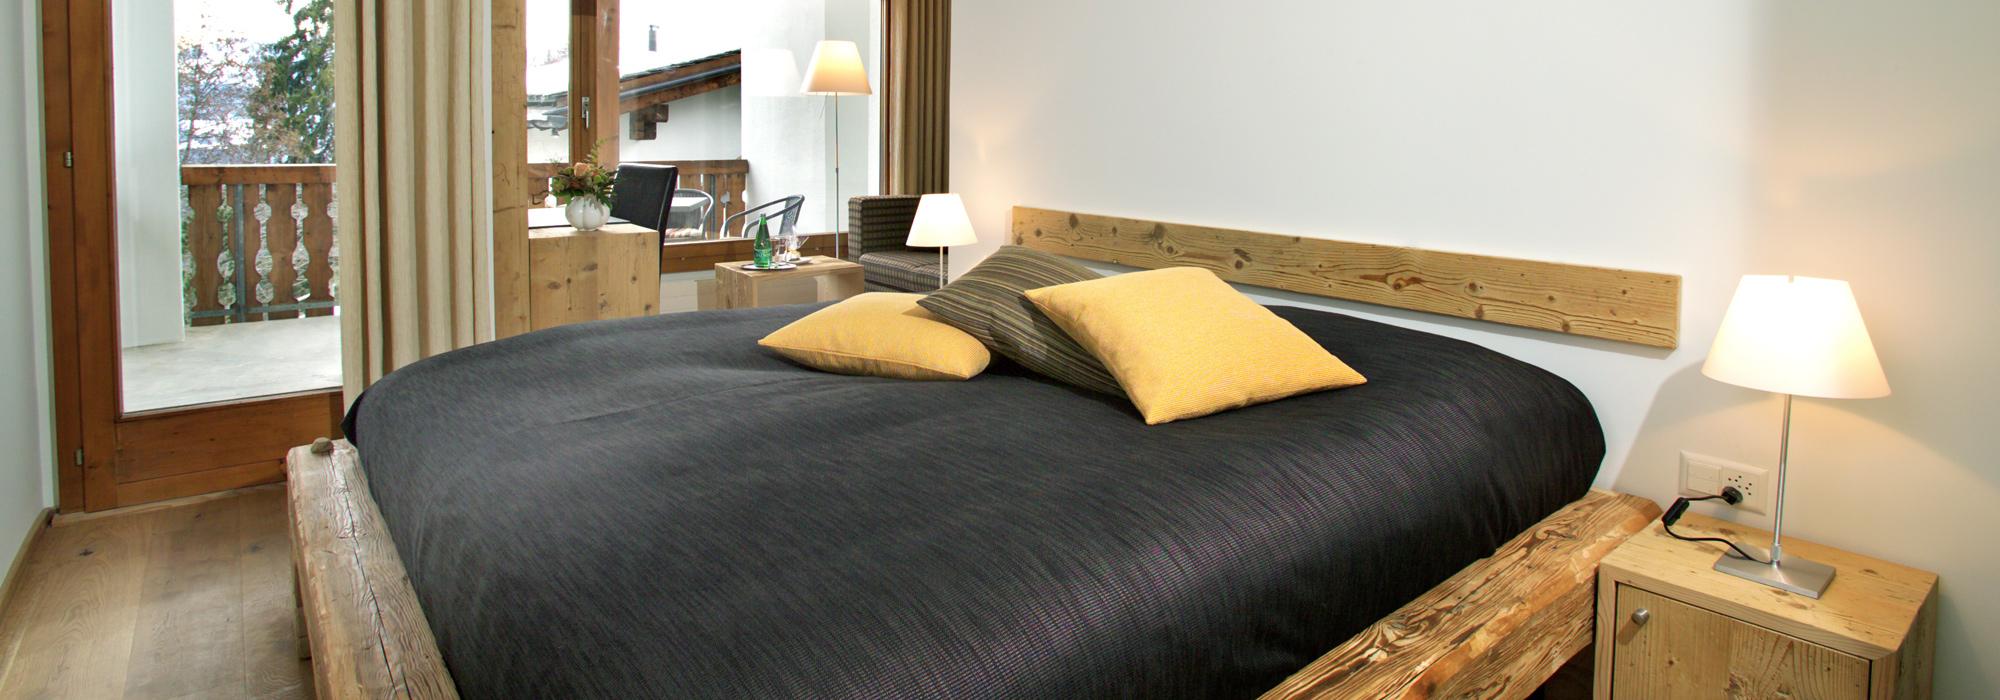 Zimmer Hotel Fidazerhof